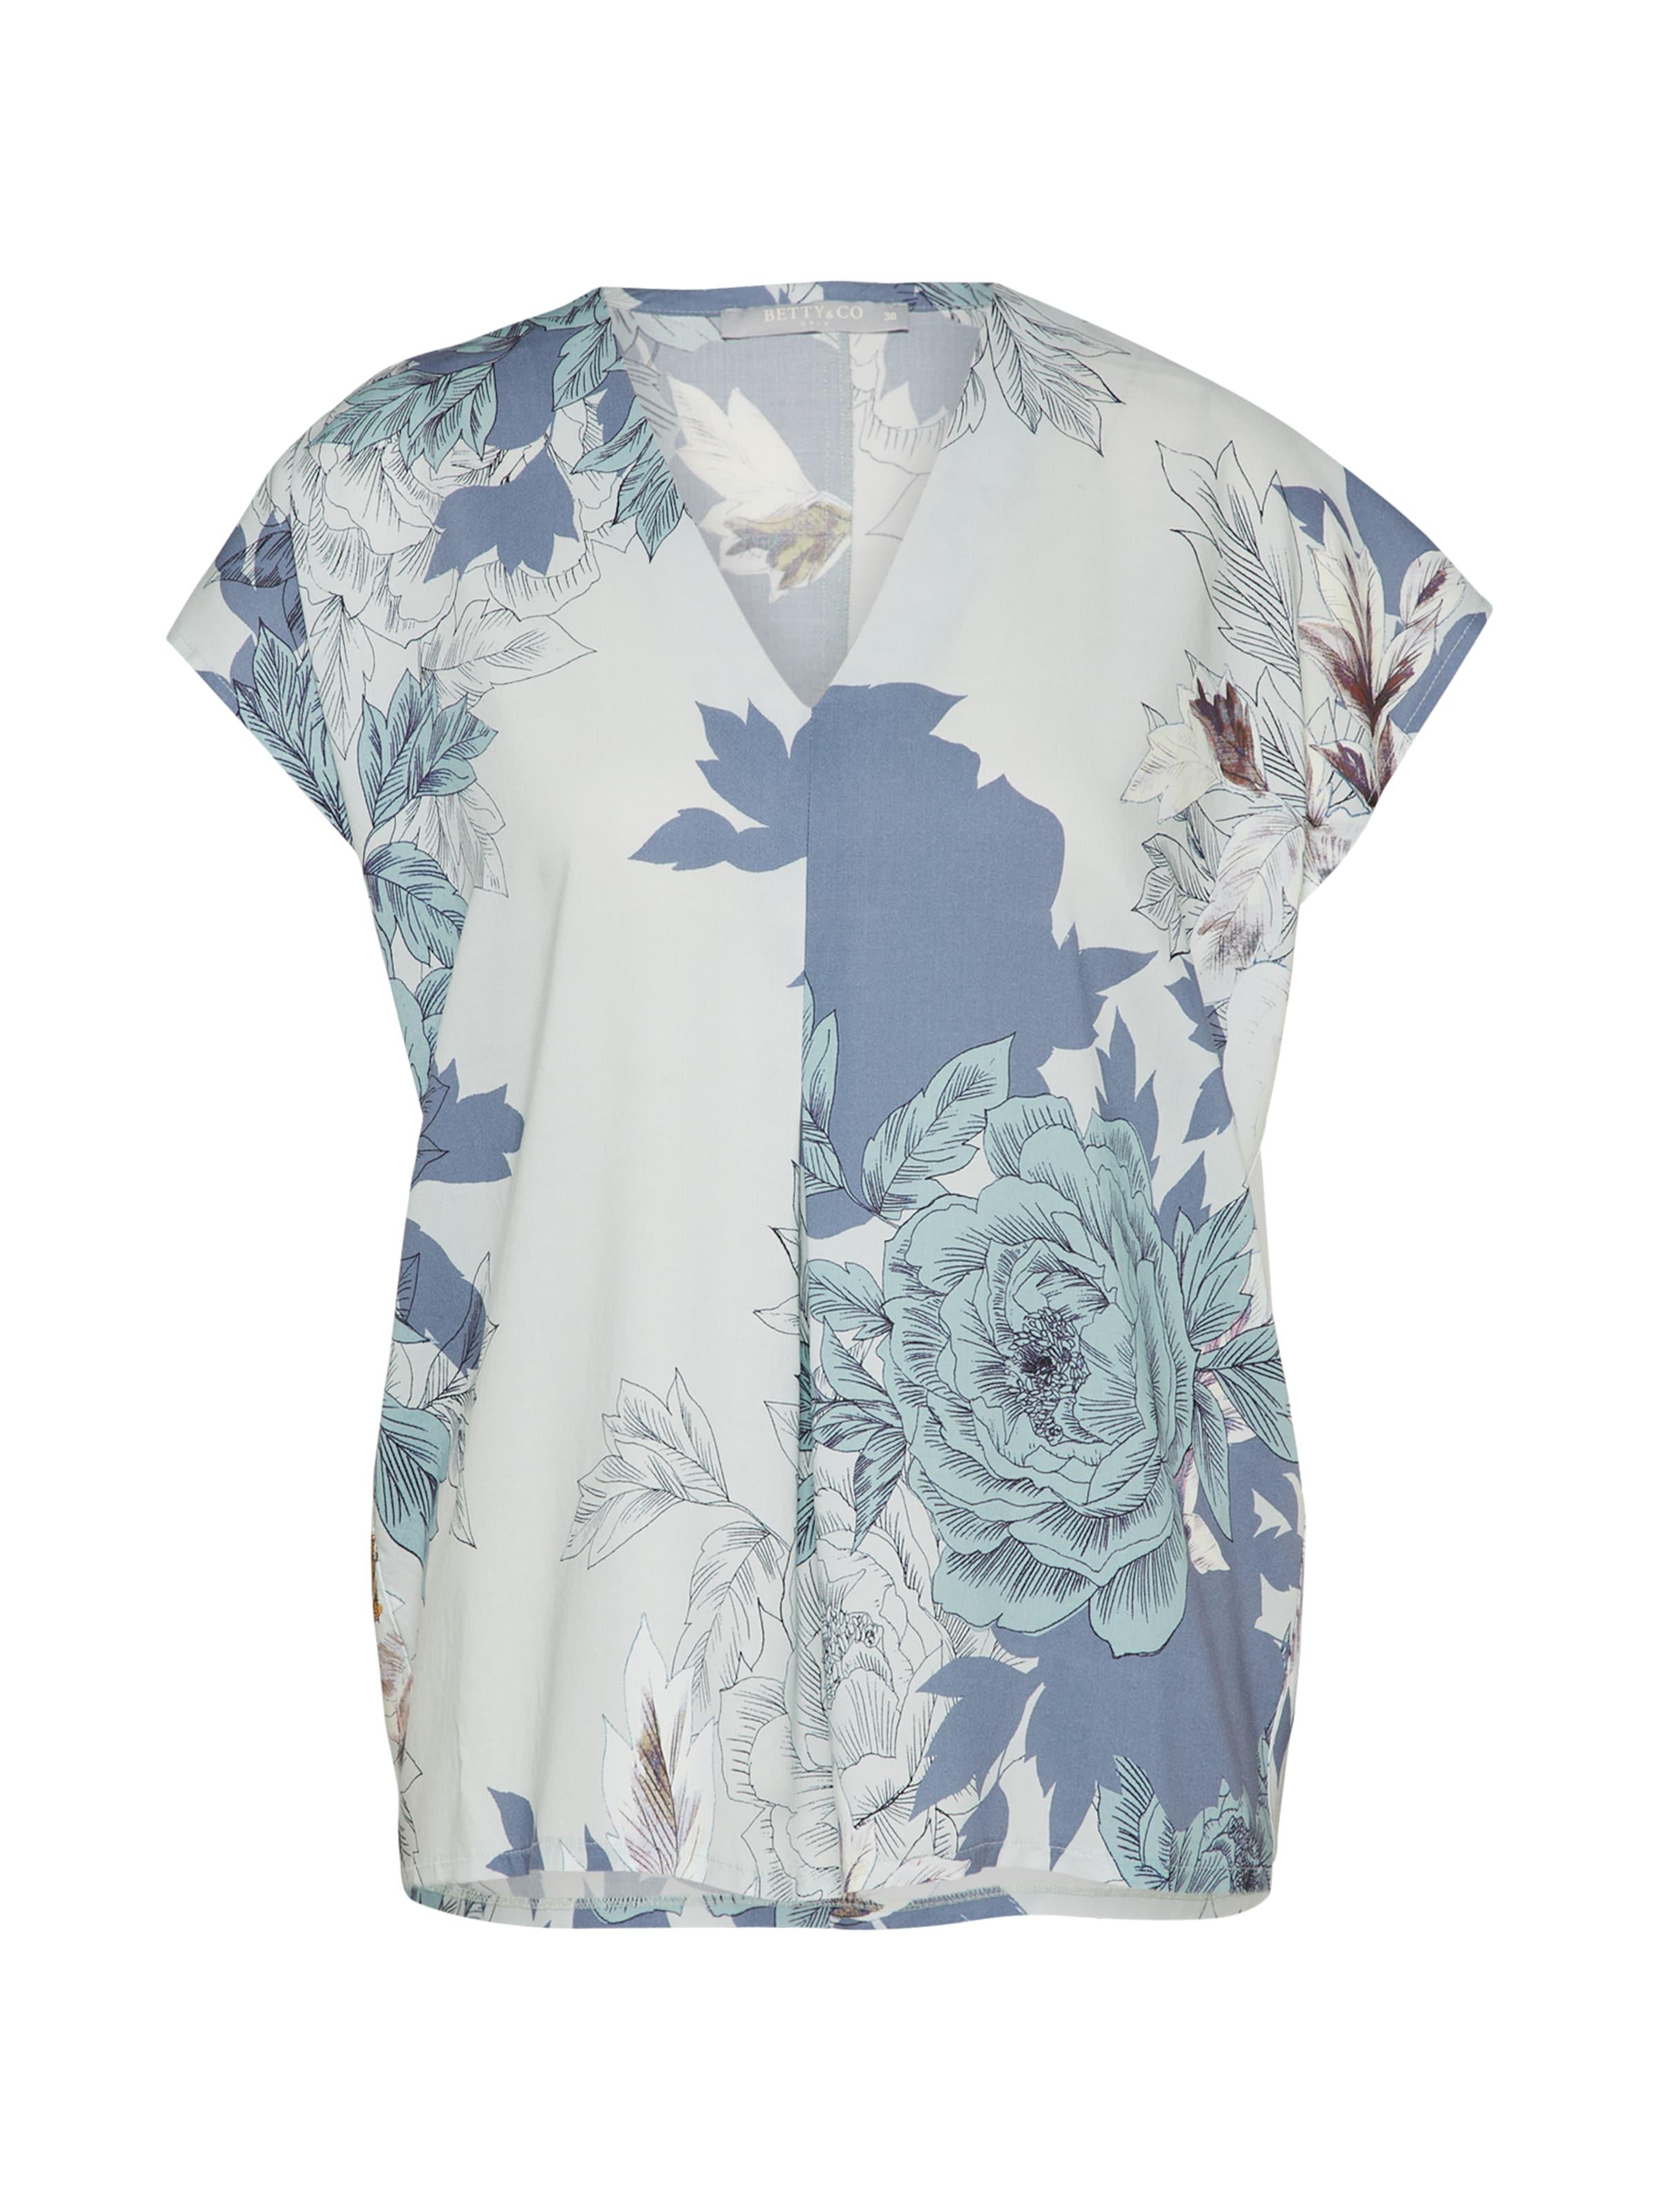 Muster Mit Floralem Bettyamp; In Co Bluse Mischfarben cAL5Rj3q4